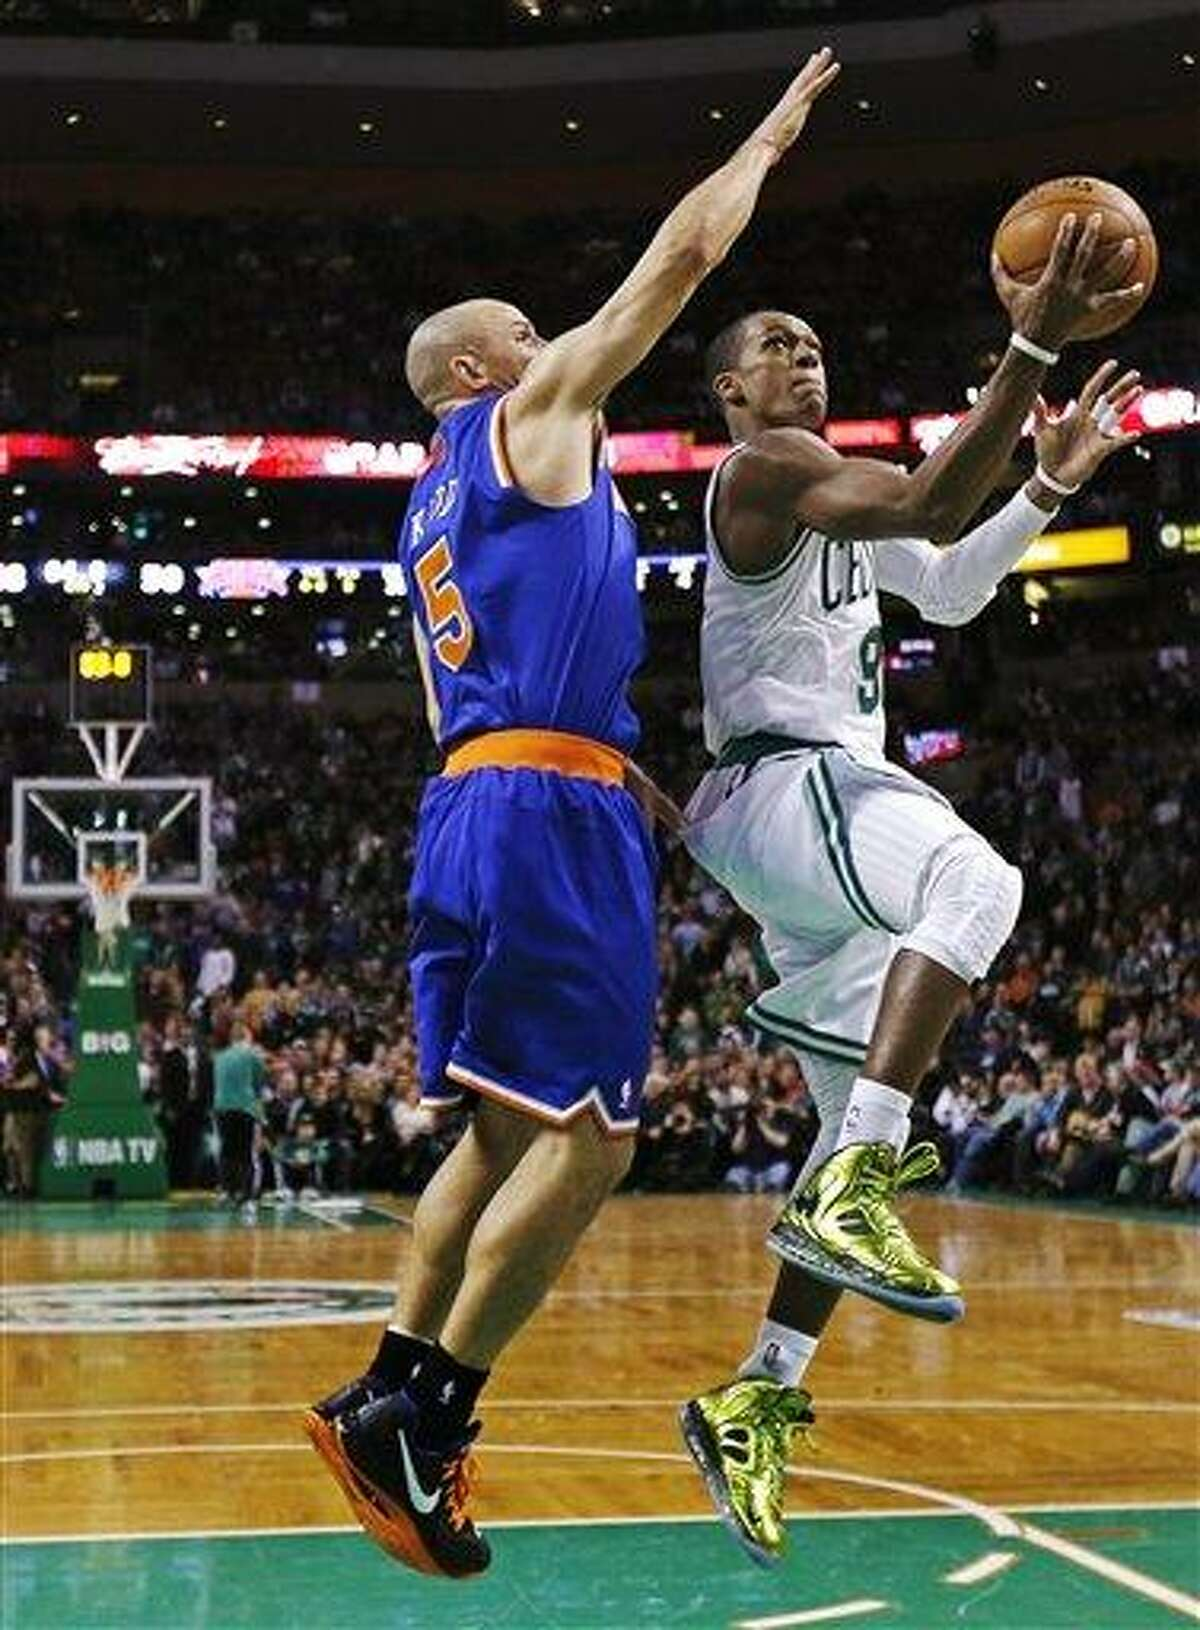 Boston Celtics guard Rajon Rondo, right, drives to the basket against New York Knicks guard Jason Kidd during the second quarter of an NBA basketball game in Boston, Thursday, Jan. 24, 2013. (AP Photo/Charles Krupa)